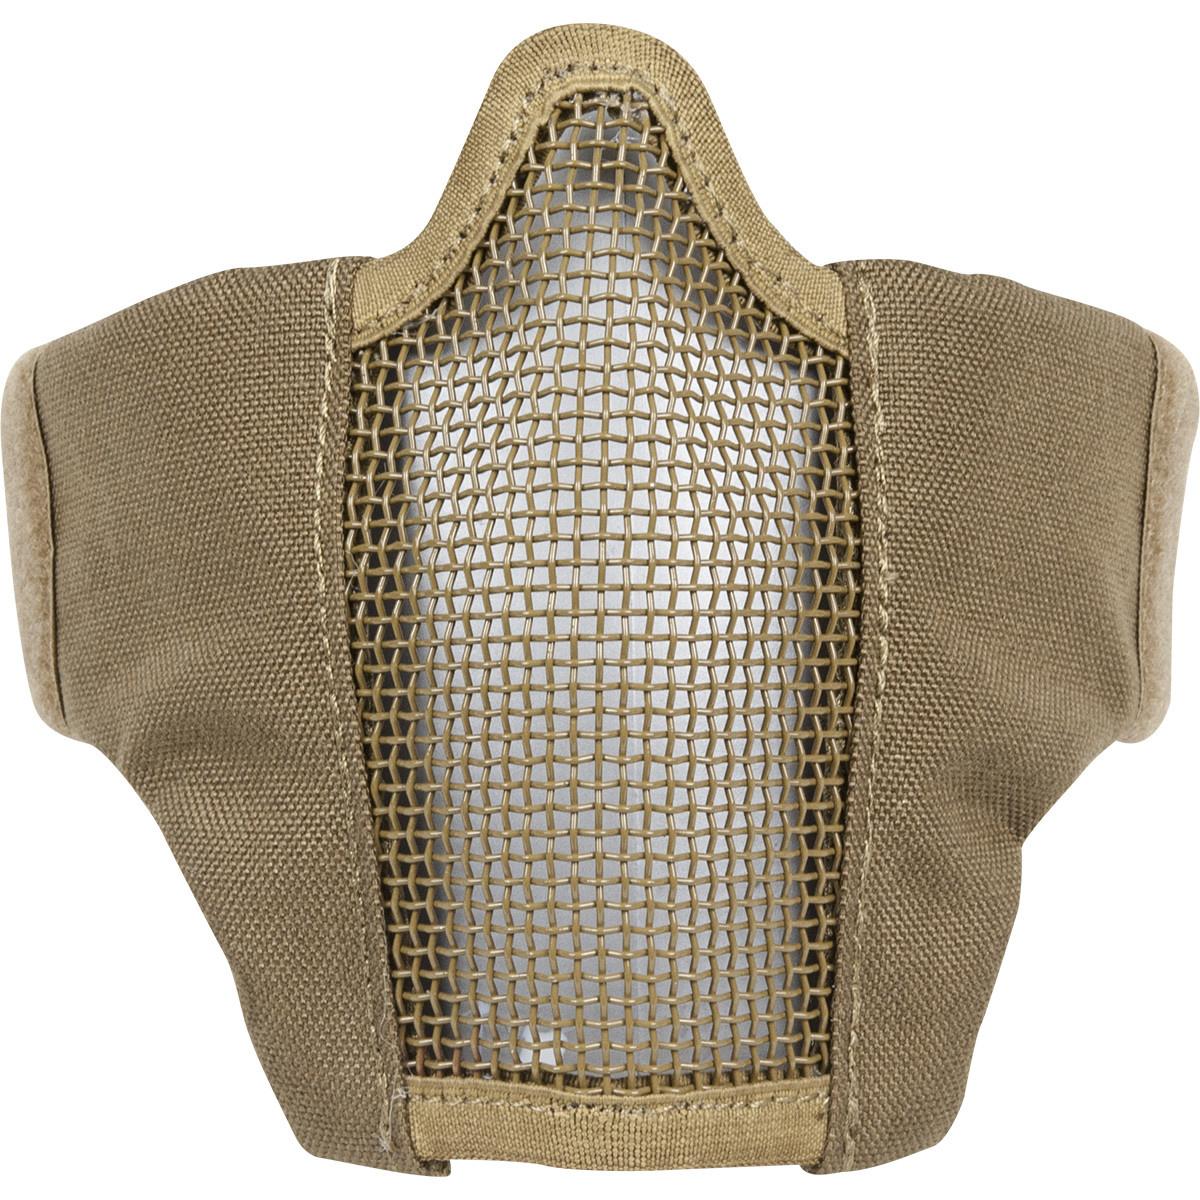 Valken Valken Tactical Tango Mesh Mask Tan